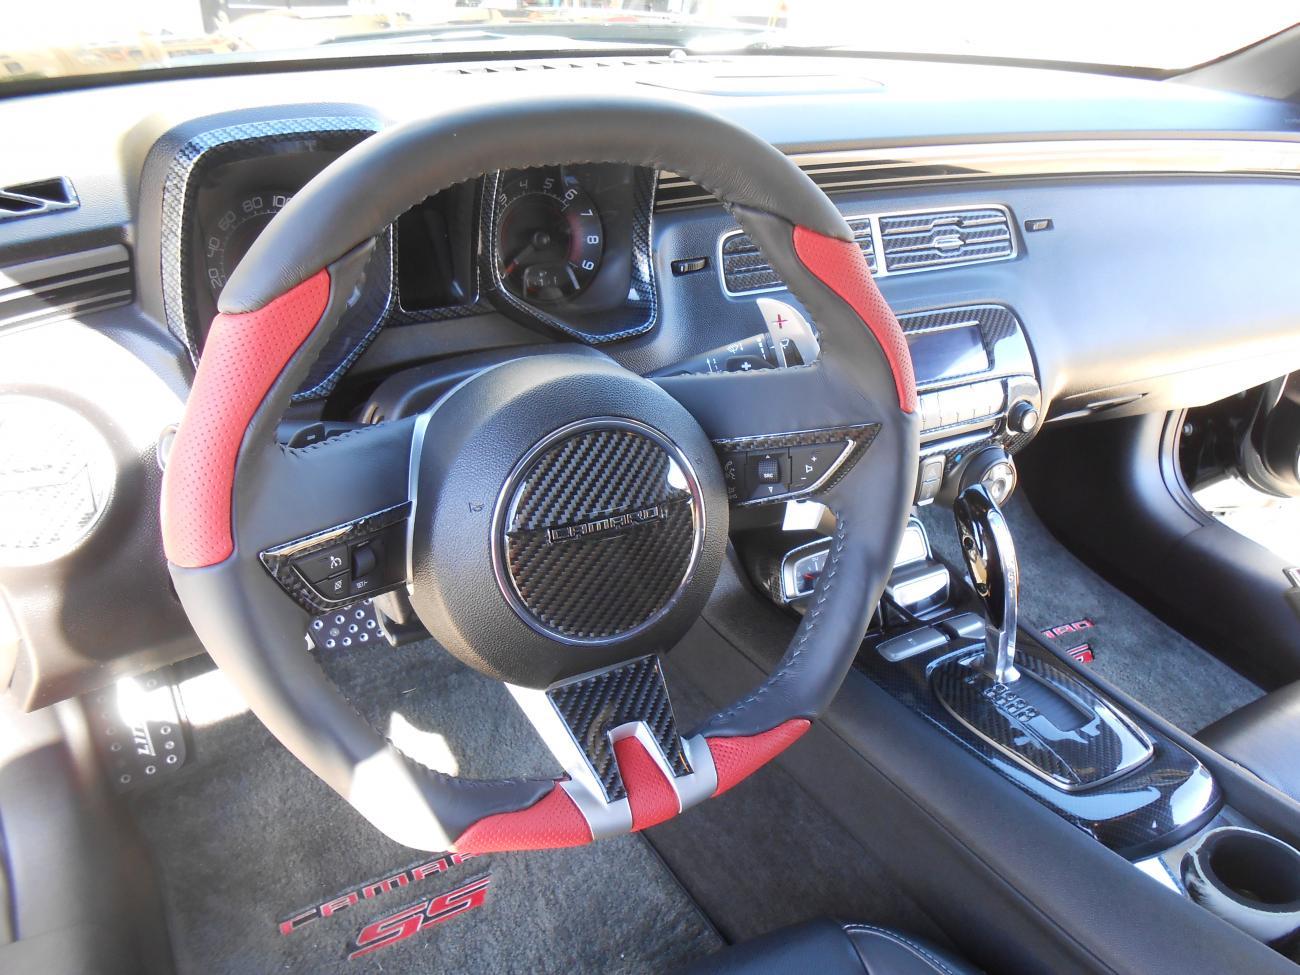 Interior Modifications Camaro5 Chevy Camaro Forum Camaro Zl1 Ss And V6 Forums